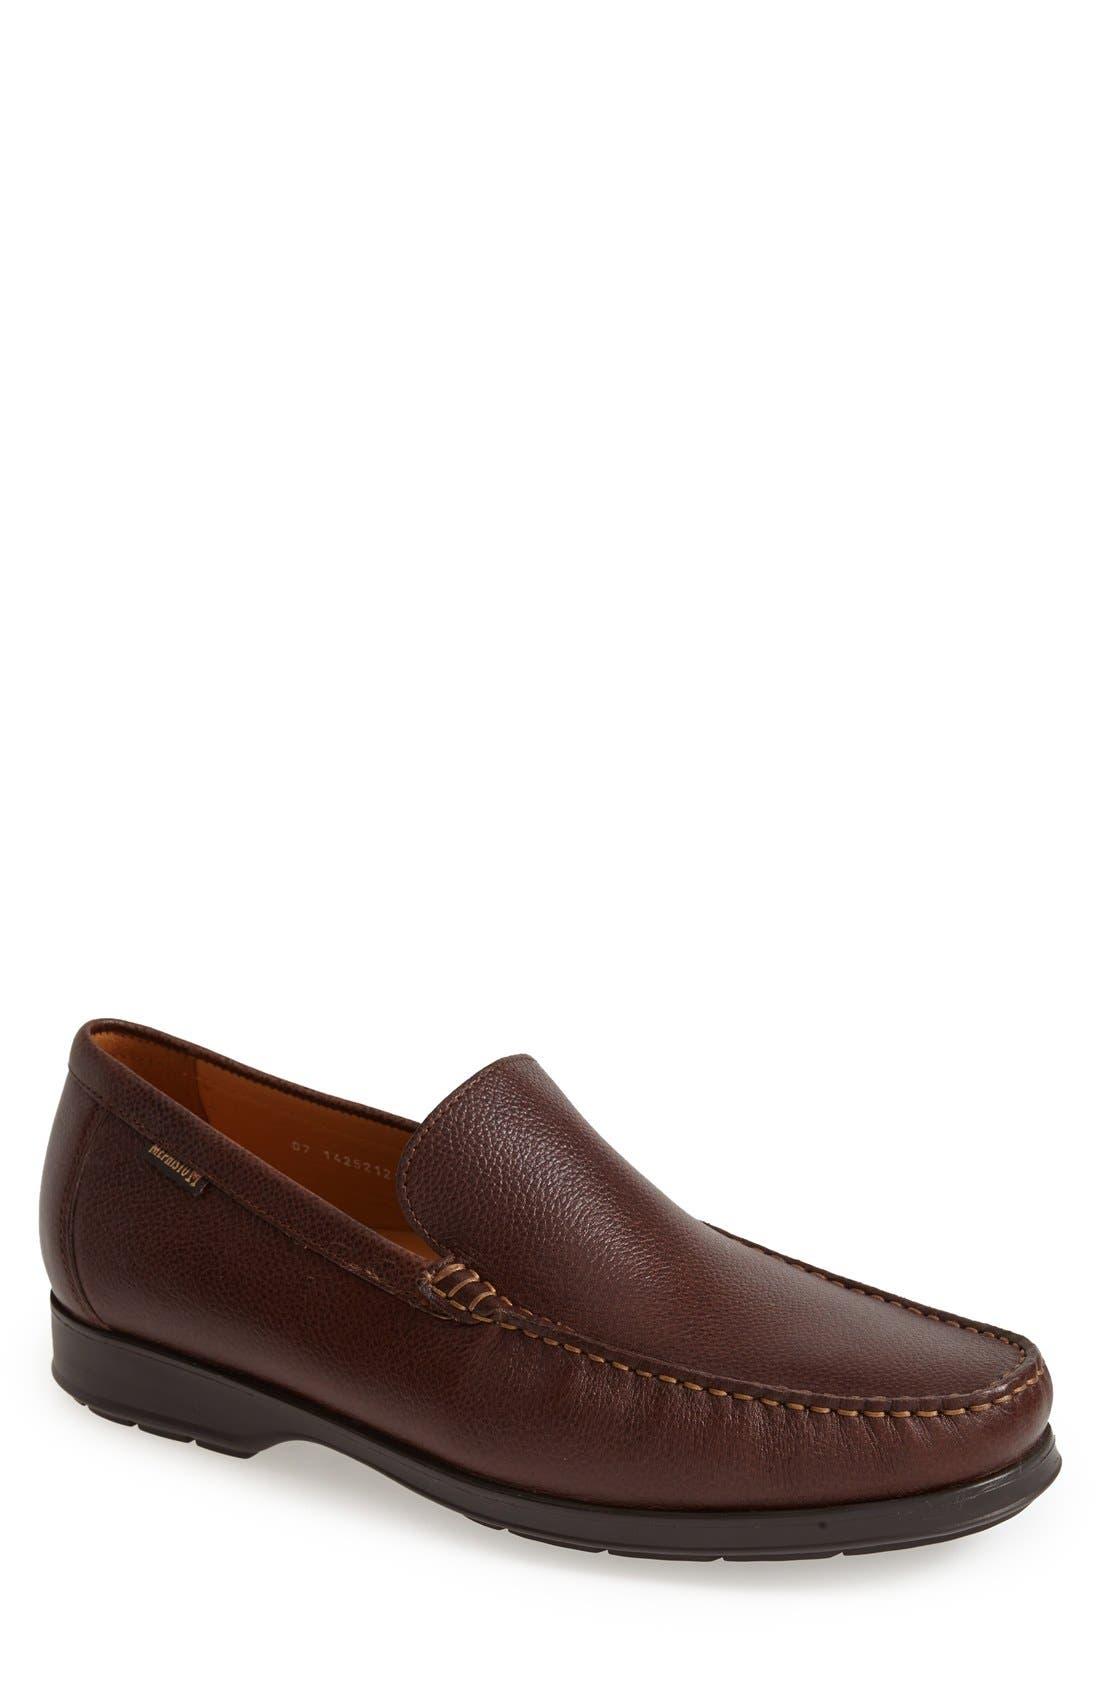 'Henri' Loafer,                             Main thumbnail 1, color,                             Chestnut Leather